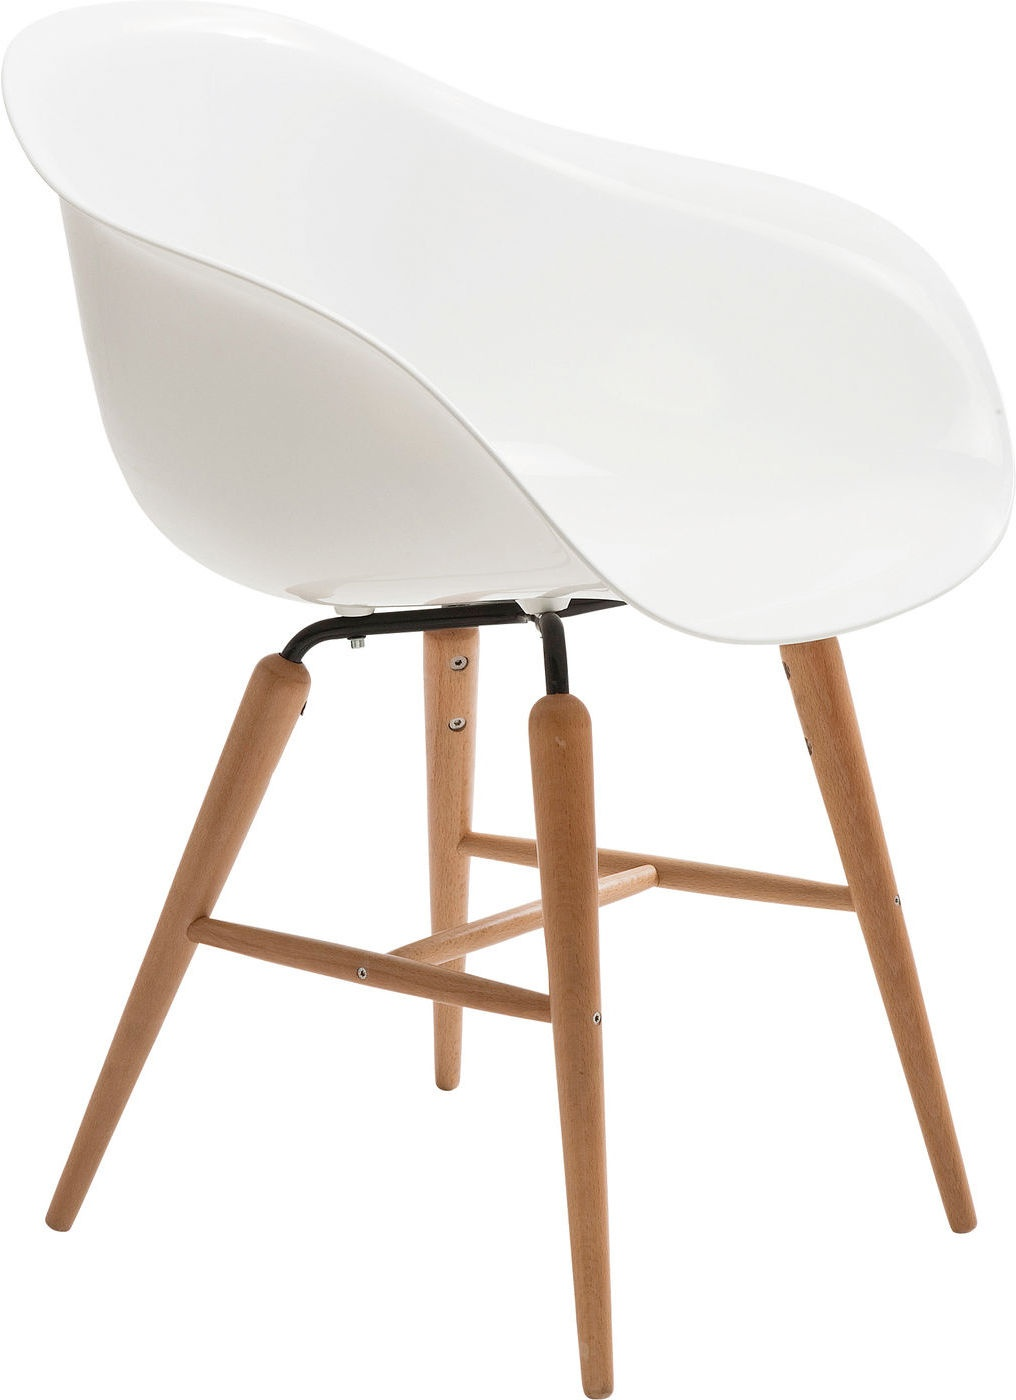 Kare design stoelen kopen online internetwinkel for Bauhaus design stoelen